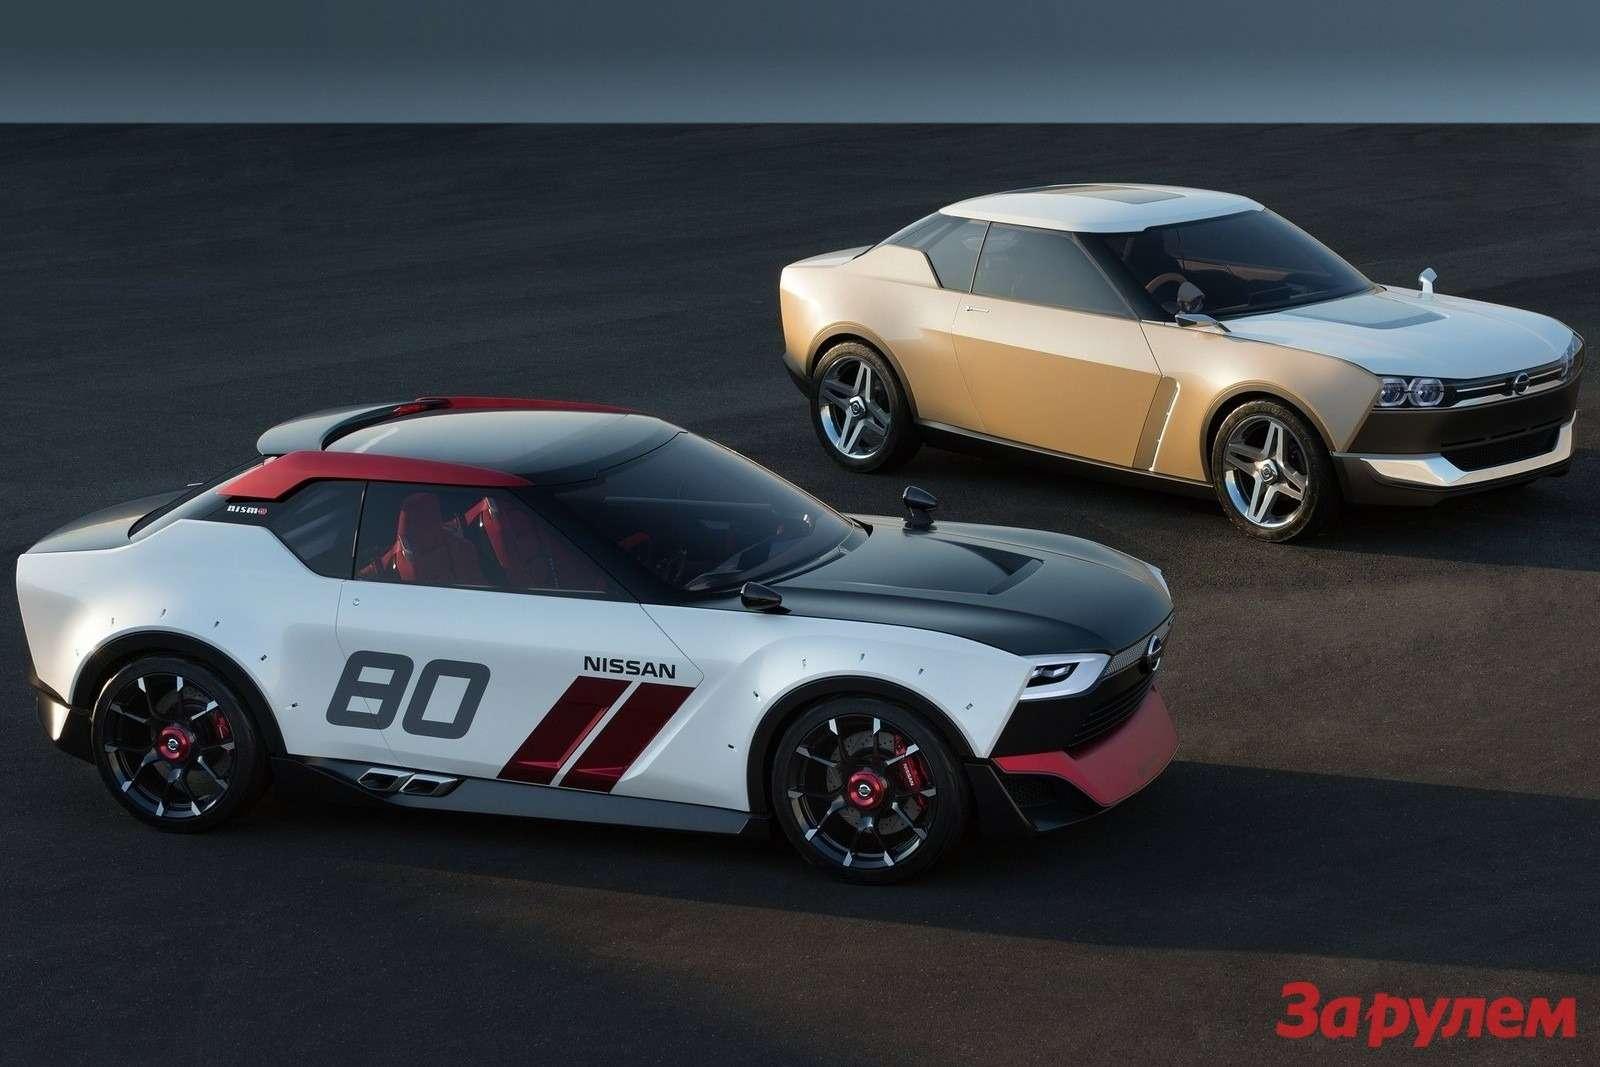 Nissan-IDx_Nismo_Concept_2013_1600x1200_wallpaper_11